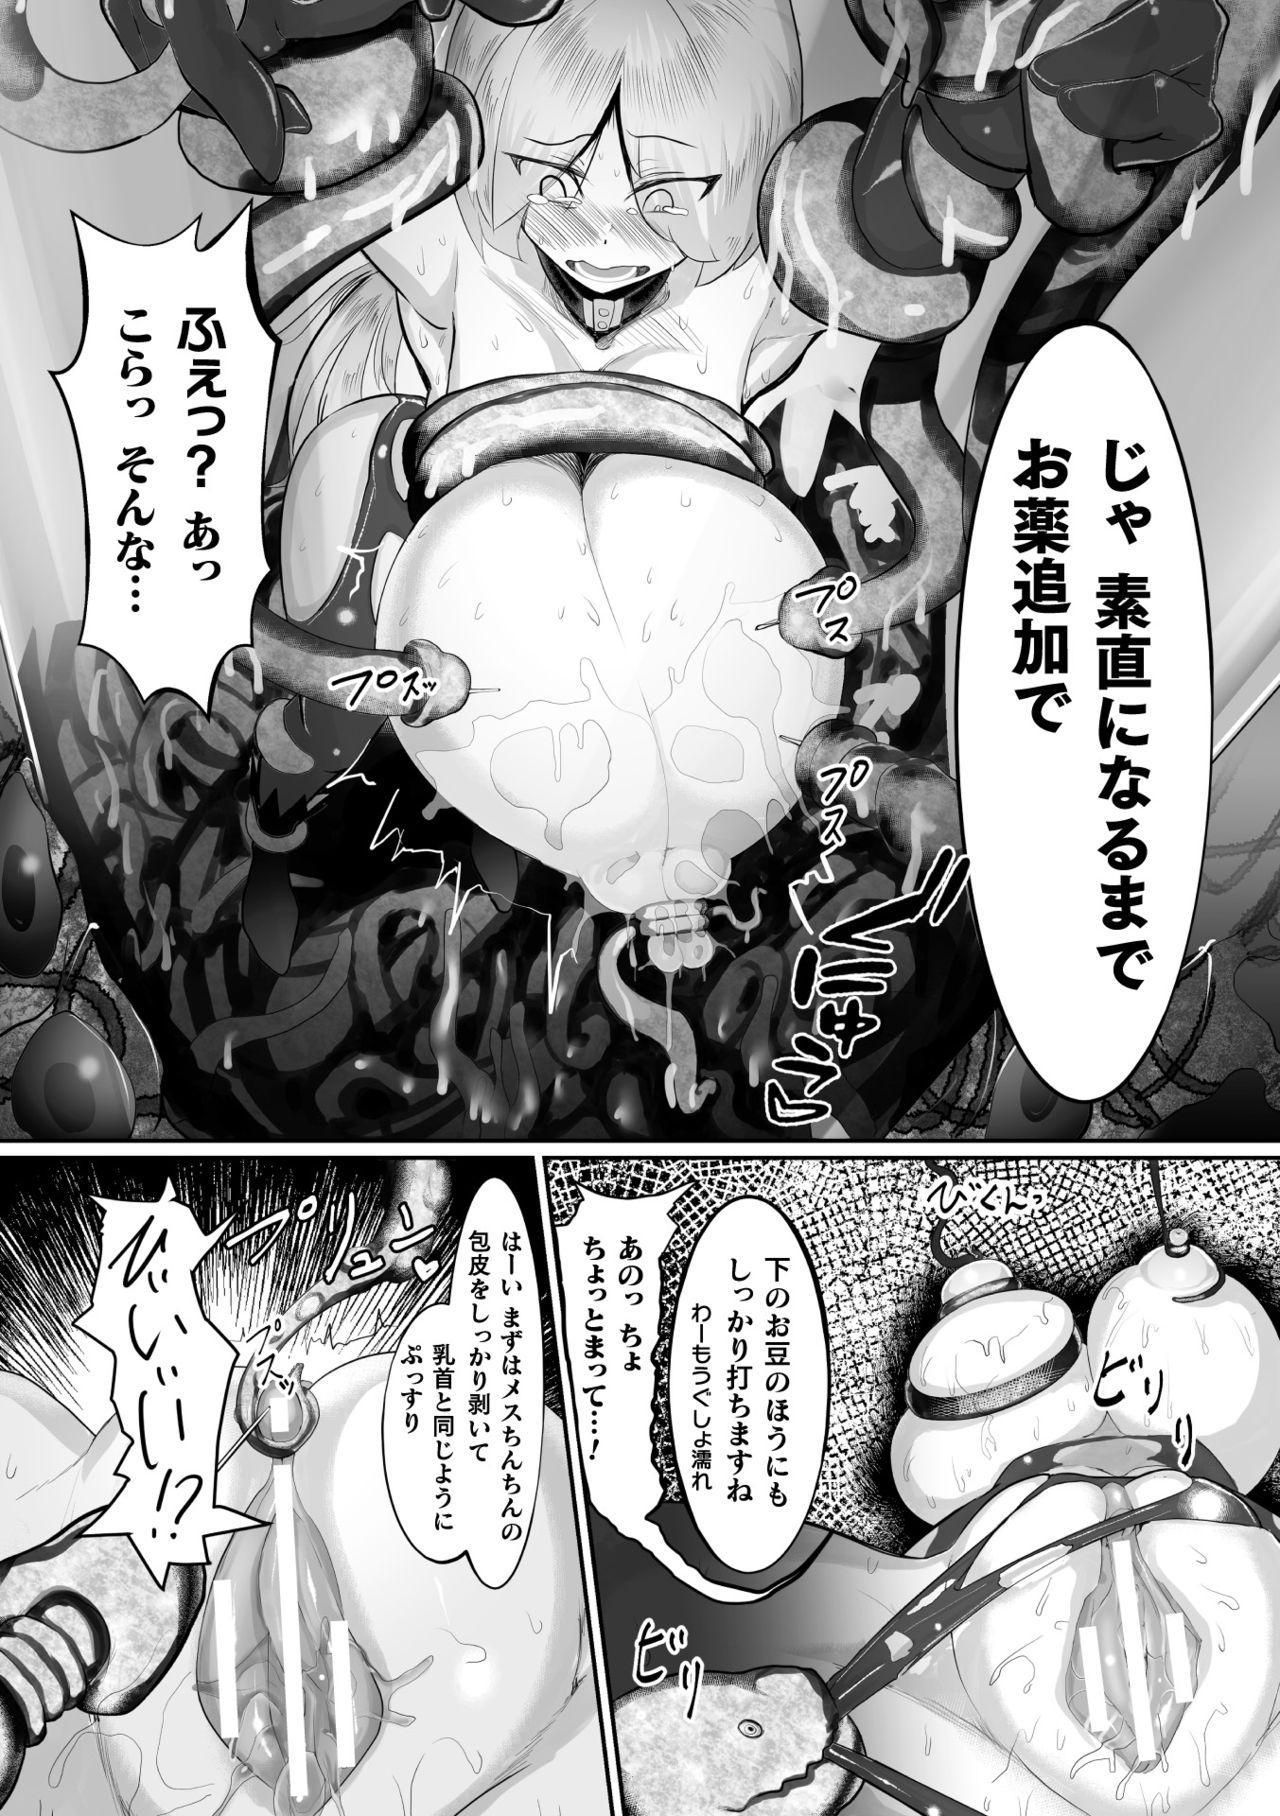 2D Comic Magazine Capsule Kan Seigi no Heroine Mesu Ochi Jikken! Vol. 2 58